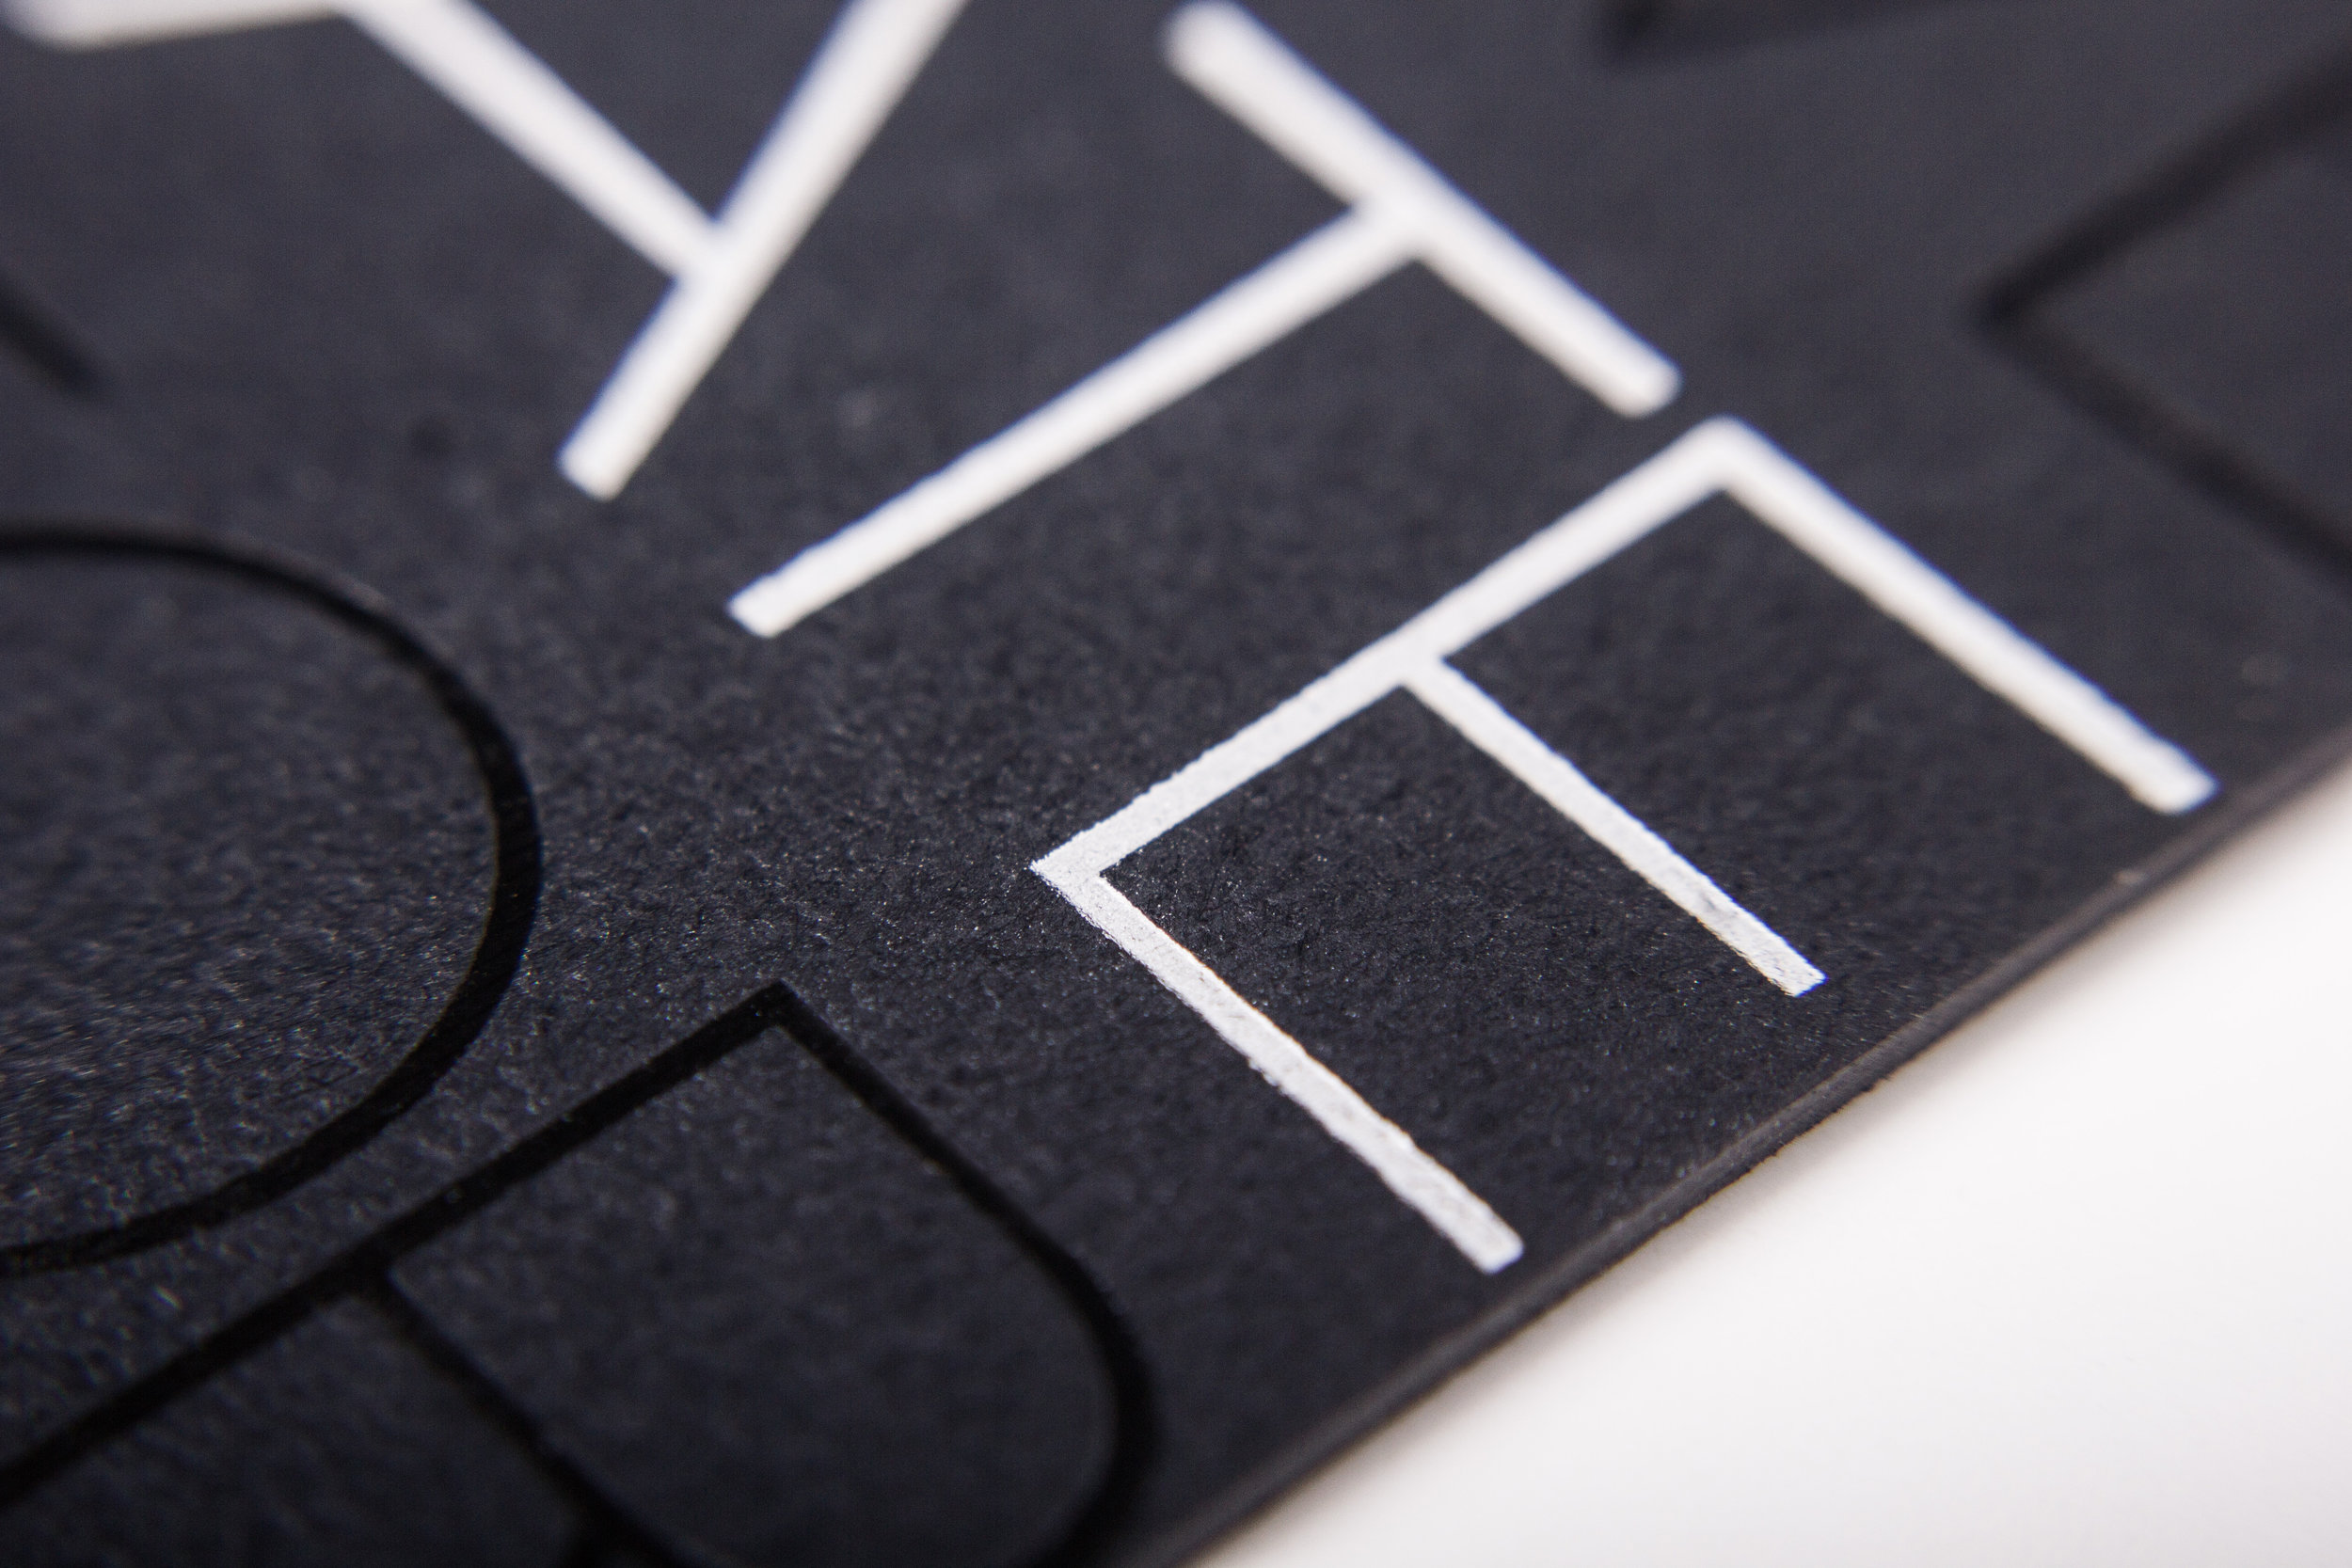 mimic-print-business-cards.jpg